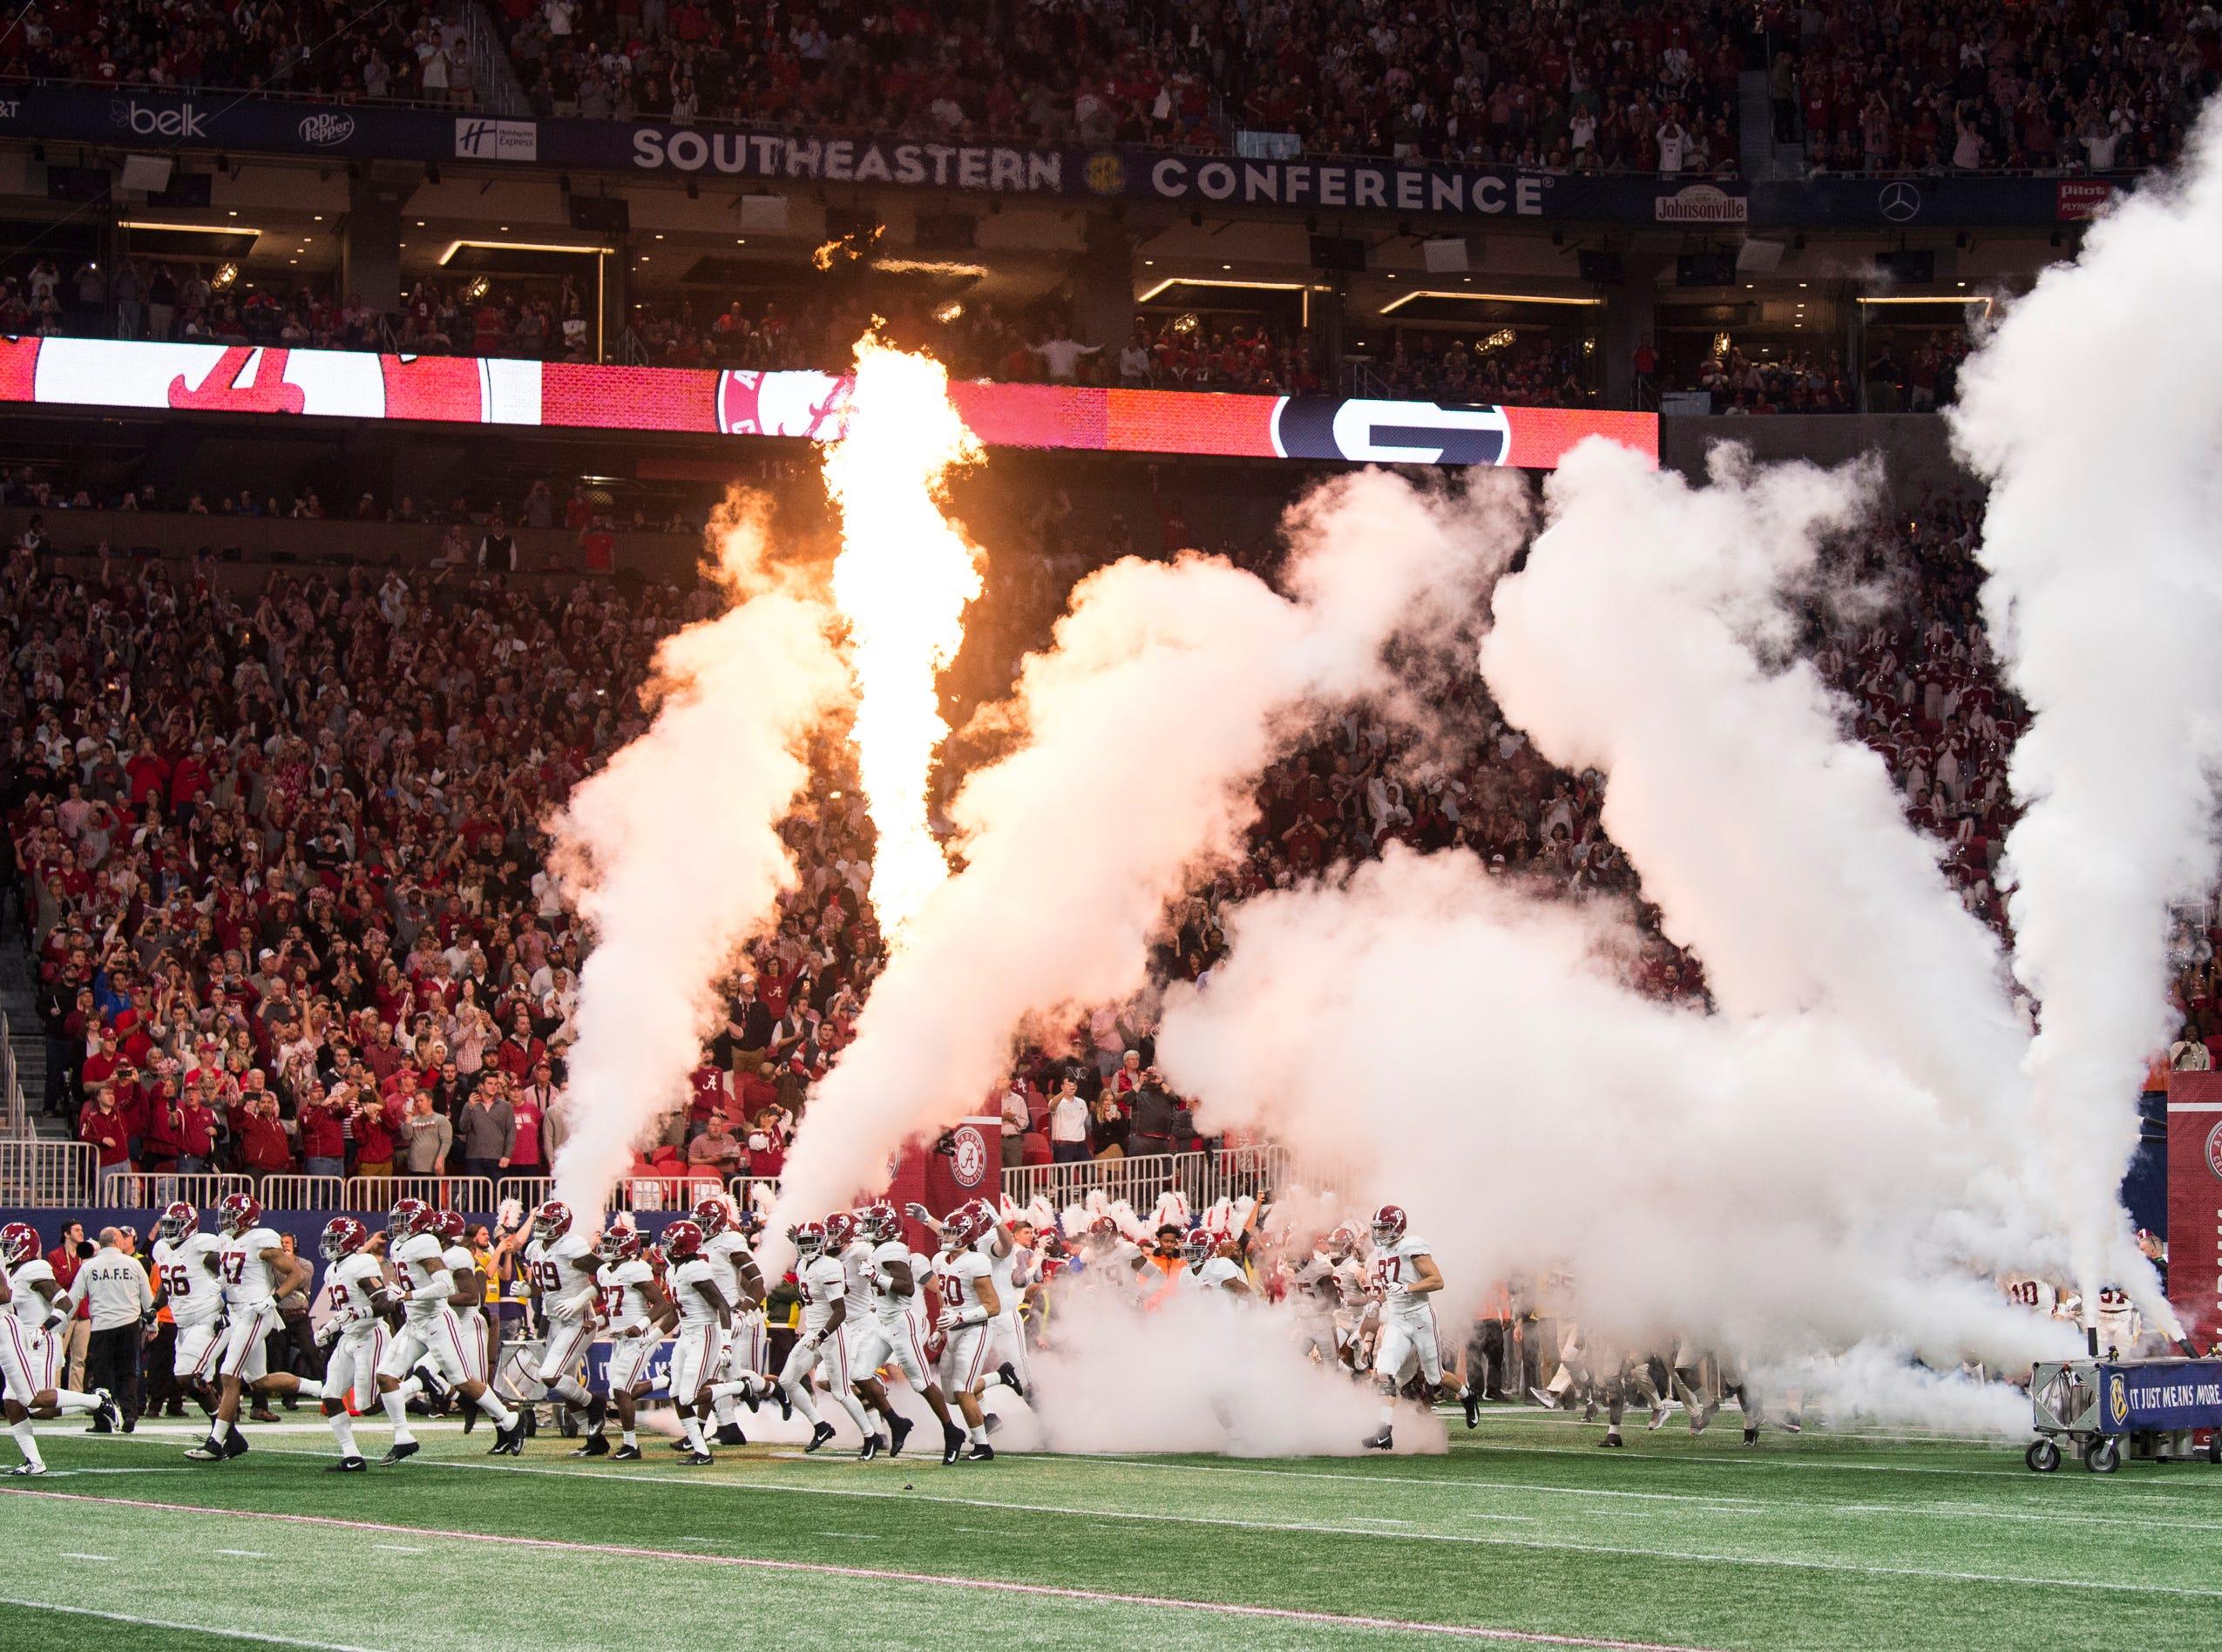 Alabama's team runs onto the field during the SEC Championship game at Mercedes-Benz Stadium in Atlanta, Ga., on Saturday Dec. 1, 2018. Georgia leads Alabama 21-14 at halftime.